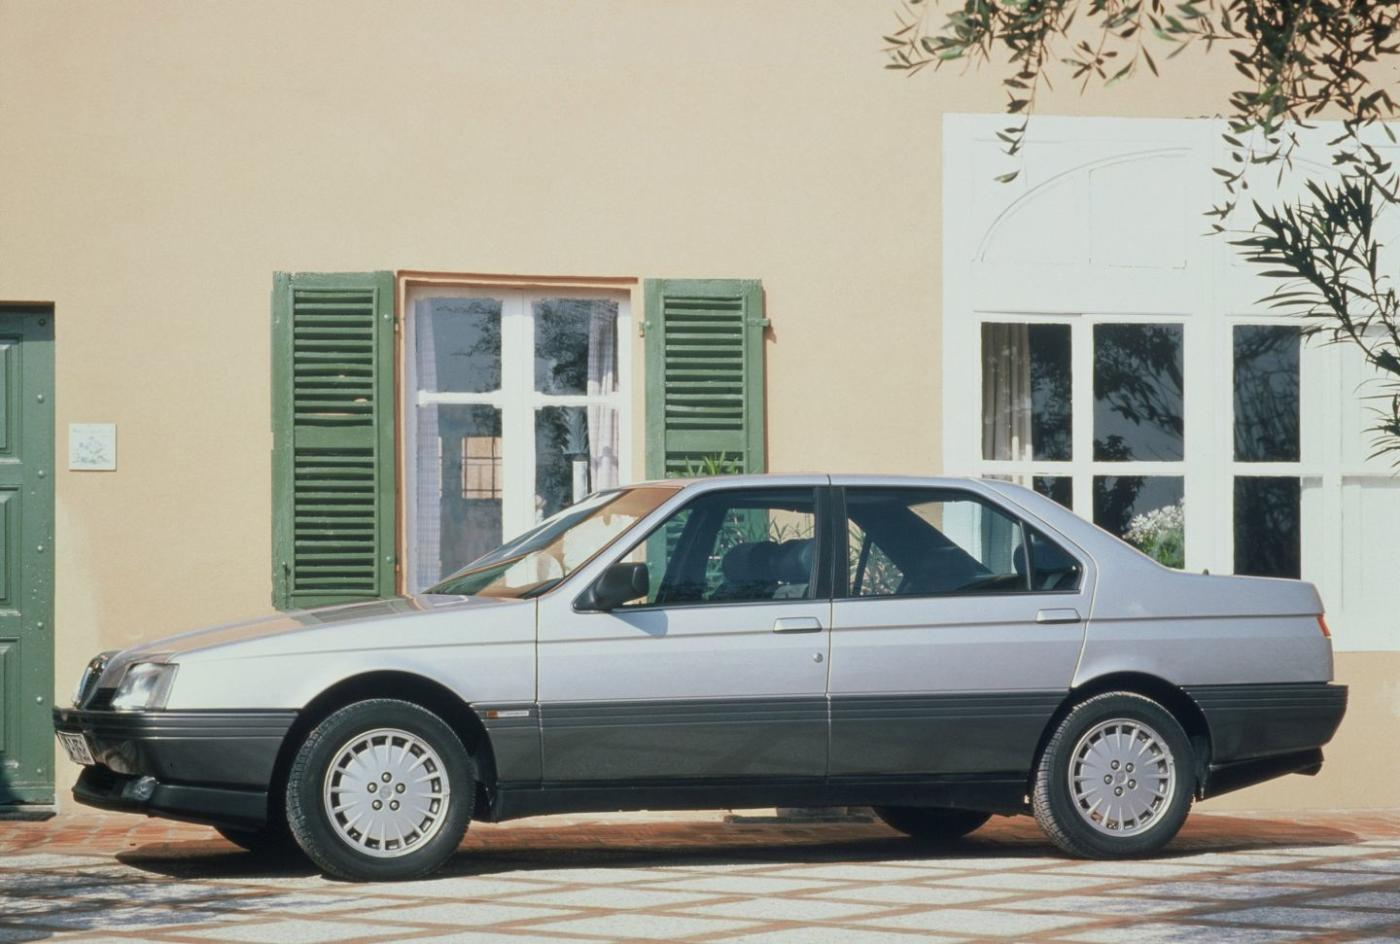 Alfa Romeo Giulia >> Le future auto d'epoca di Alfa Romeo, Fiat e Lancia